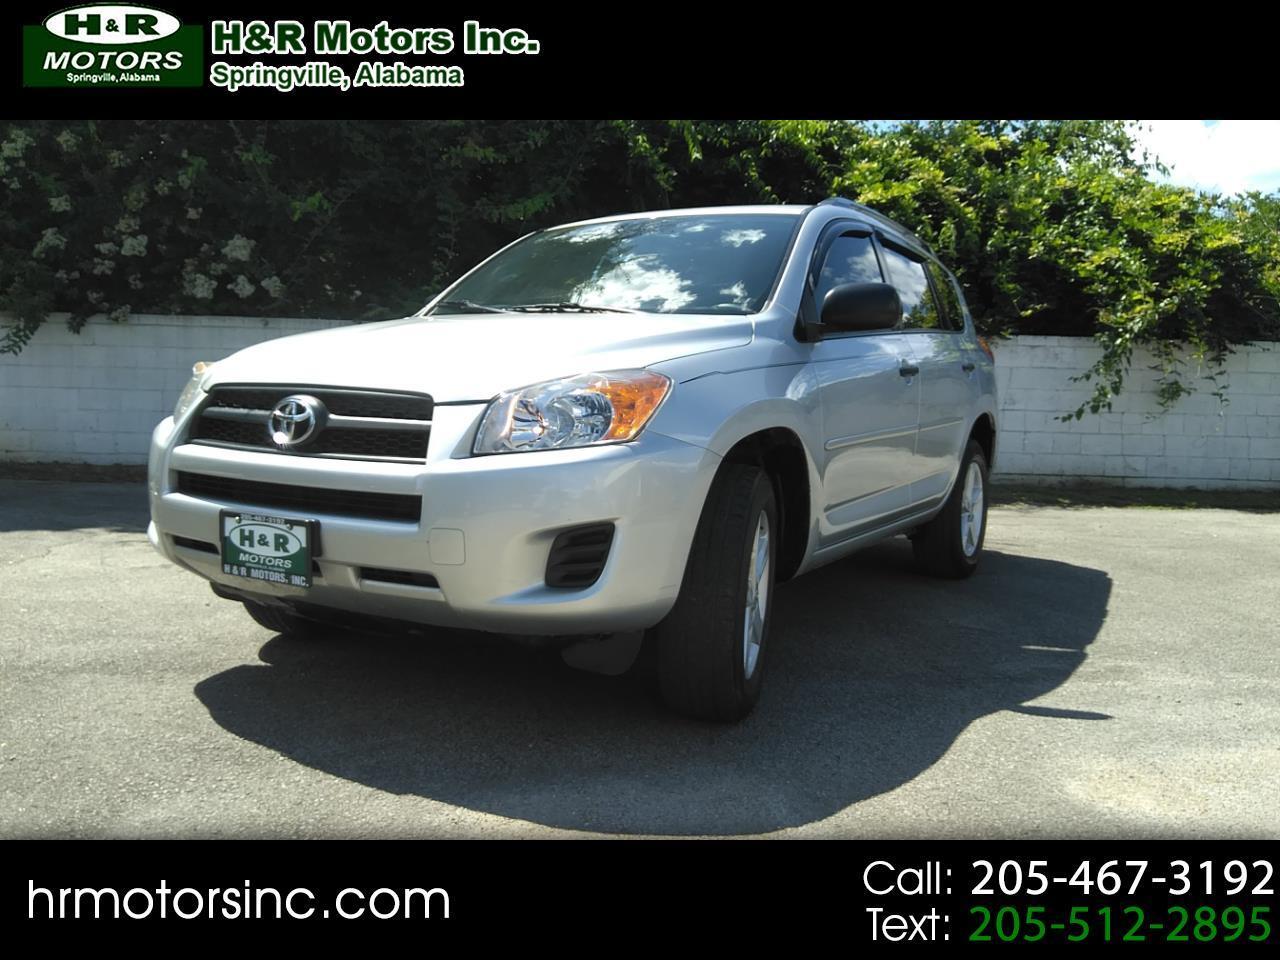 2011 Toyota RAV4 FWD 4dr 4-cyl 4-Spd AT (Natl)